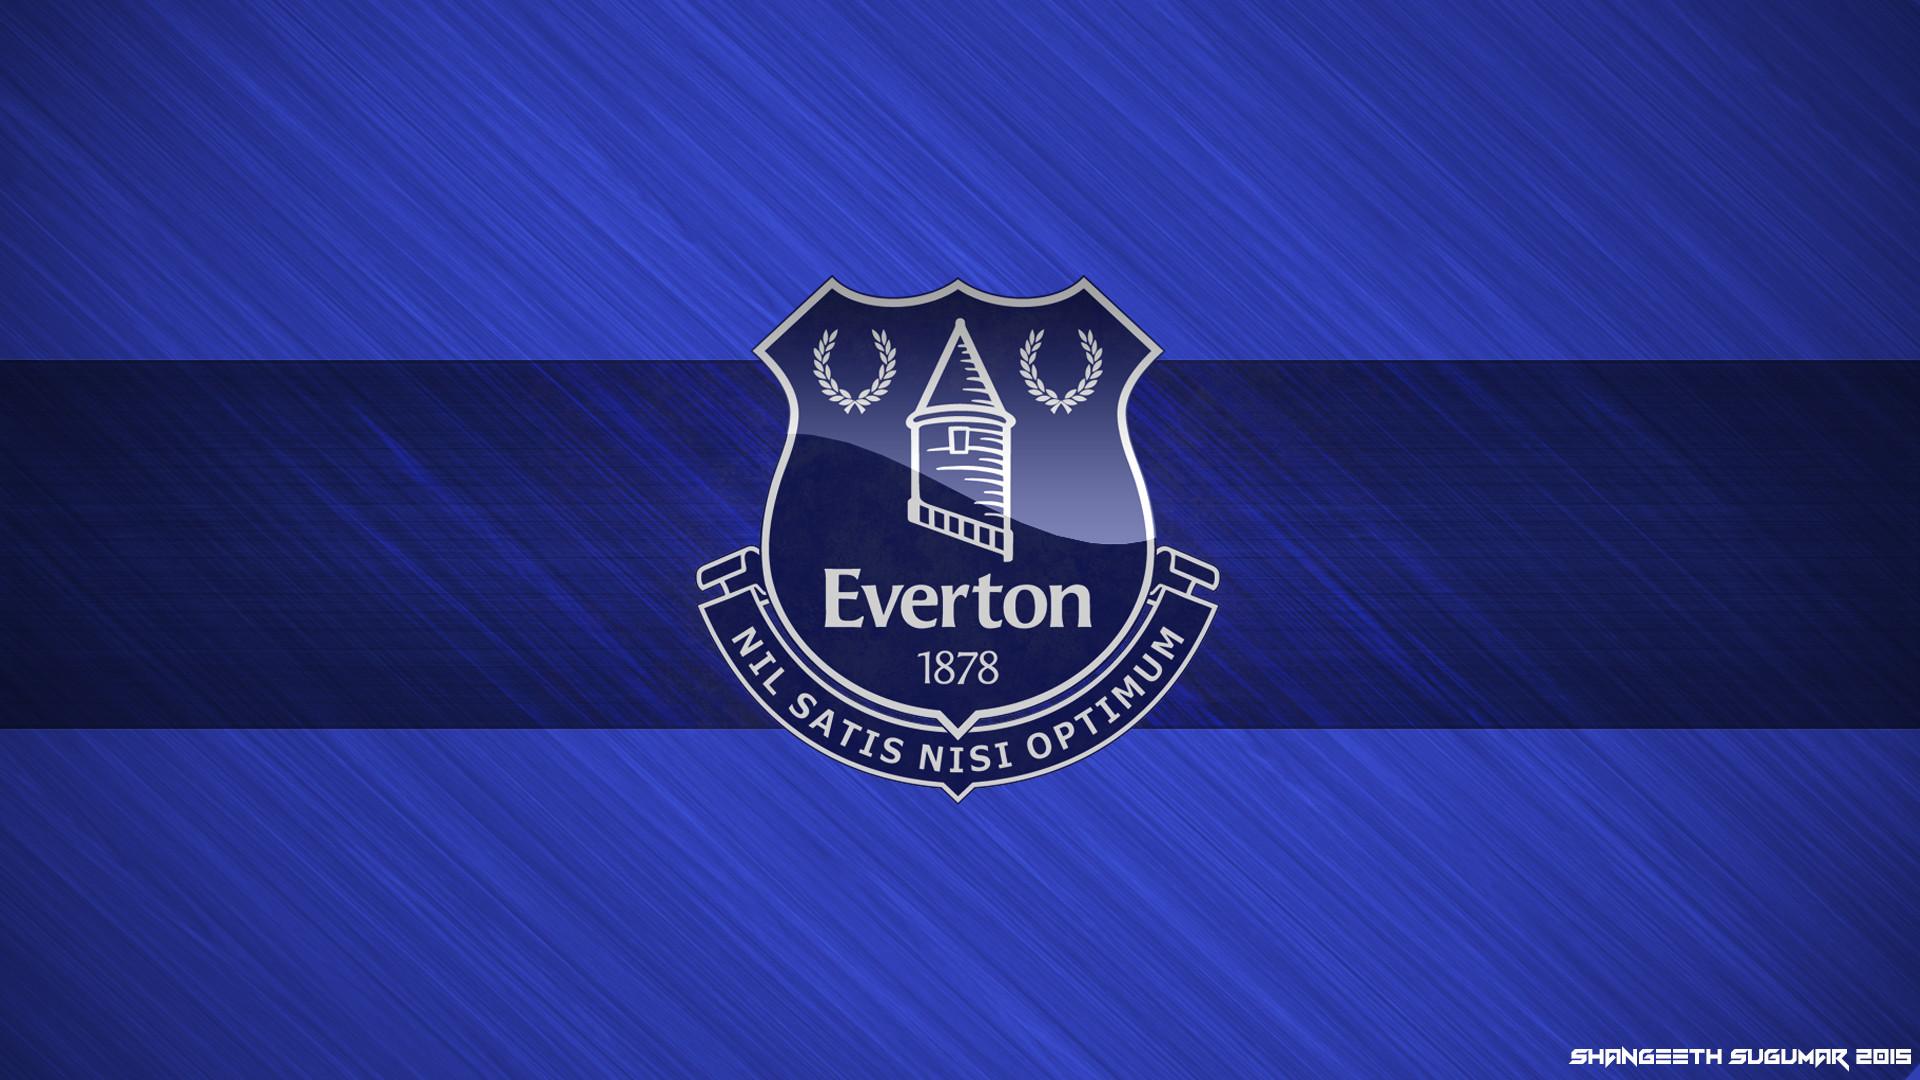 25 best ideas about Rooney everton on Pinterest | Wayne rooney .